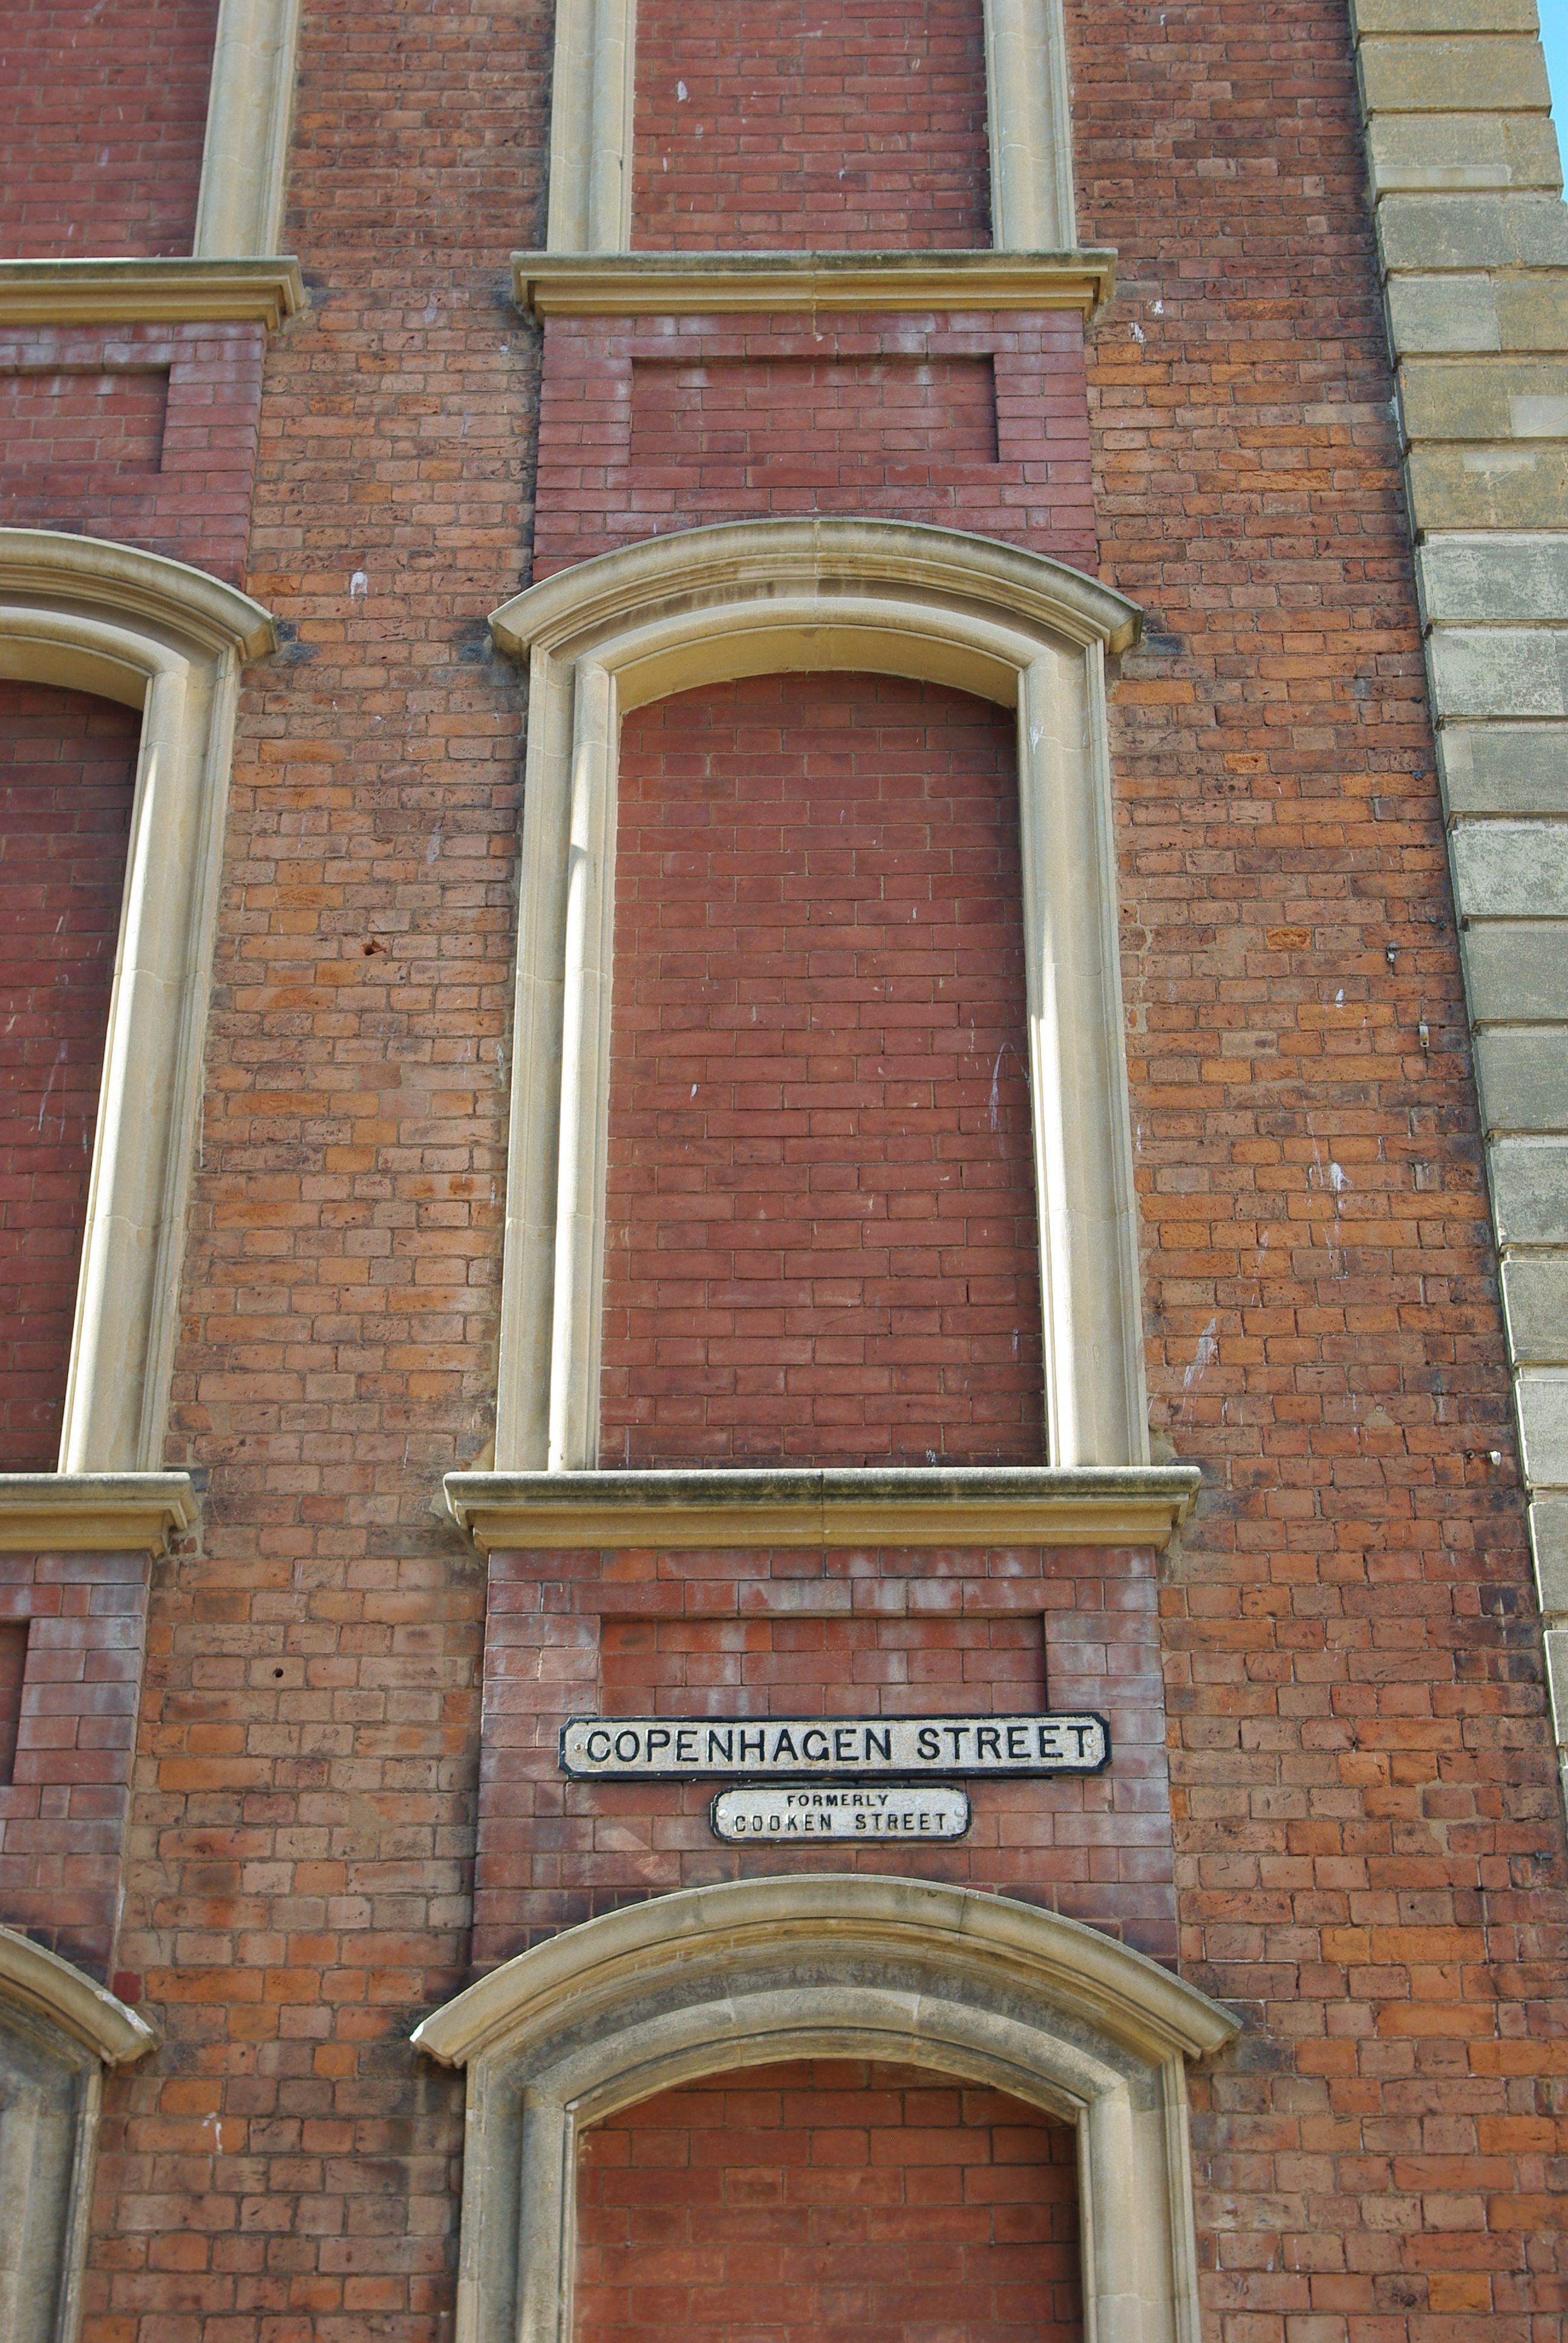 Tiles 4_5 4_6 4_7 Worcester city centre hidden history